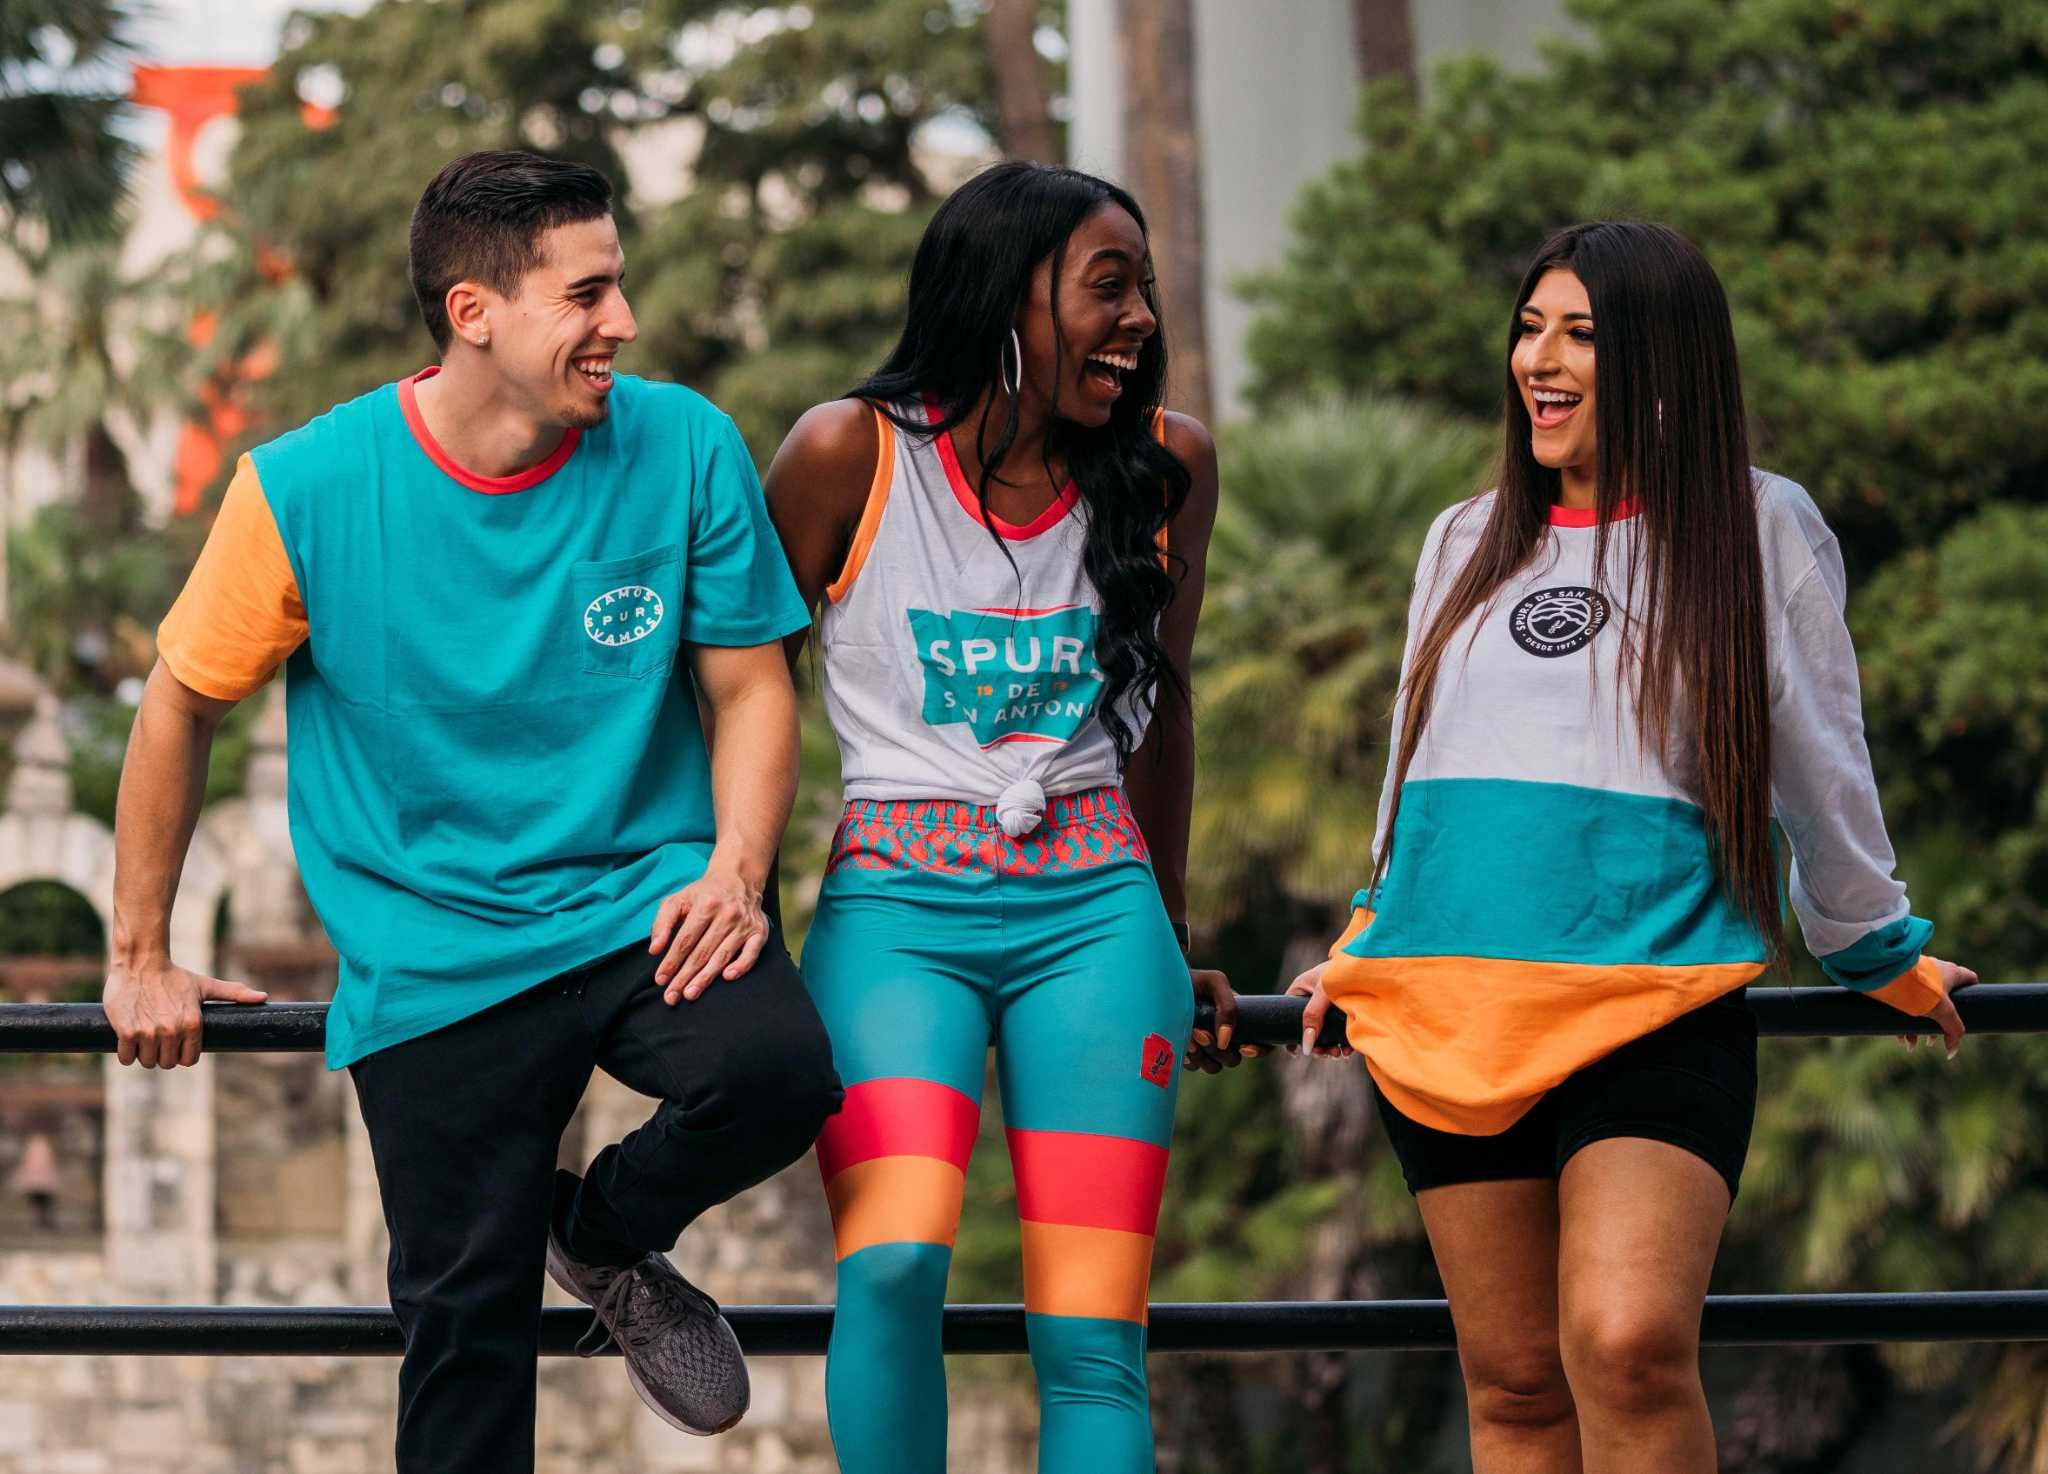 San Antonio Spurs reveal colorful streetwear line to celebrate Hispanic heritage